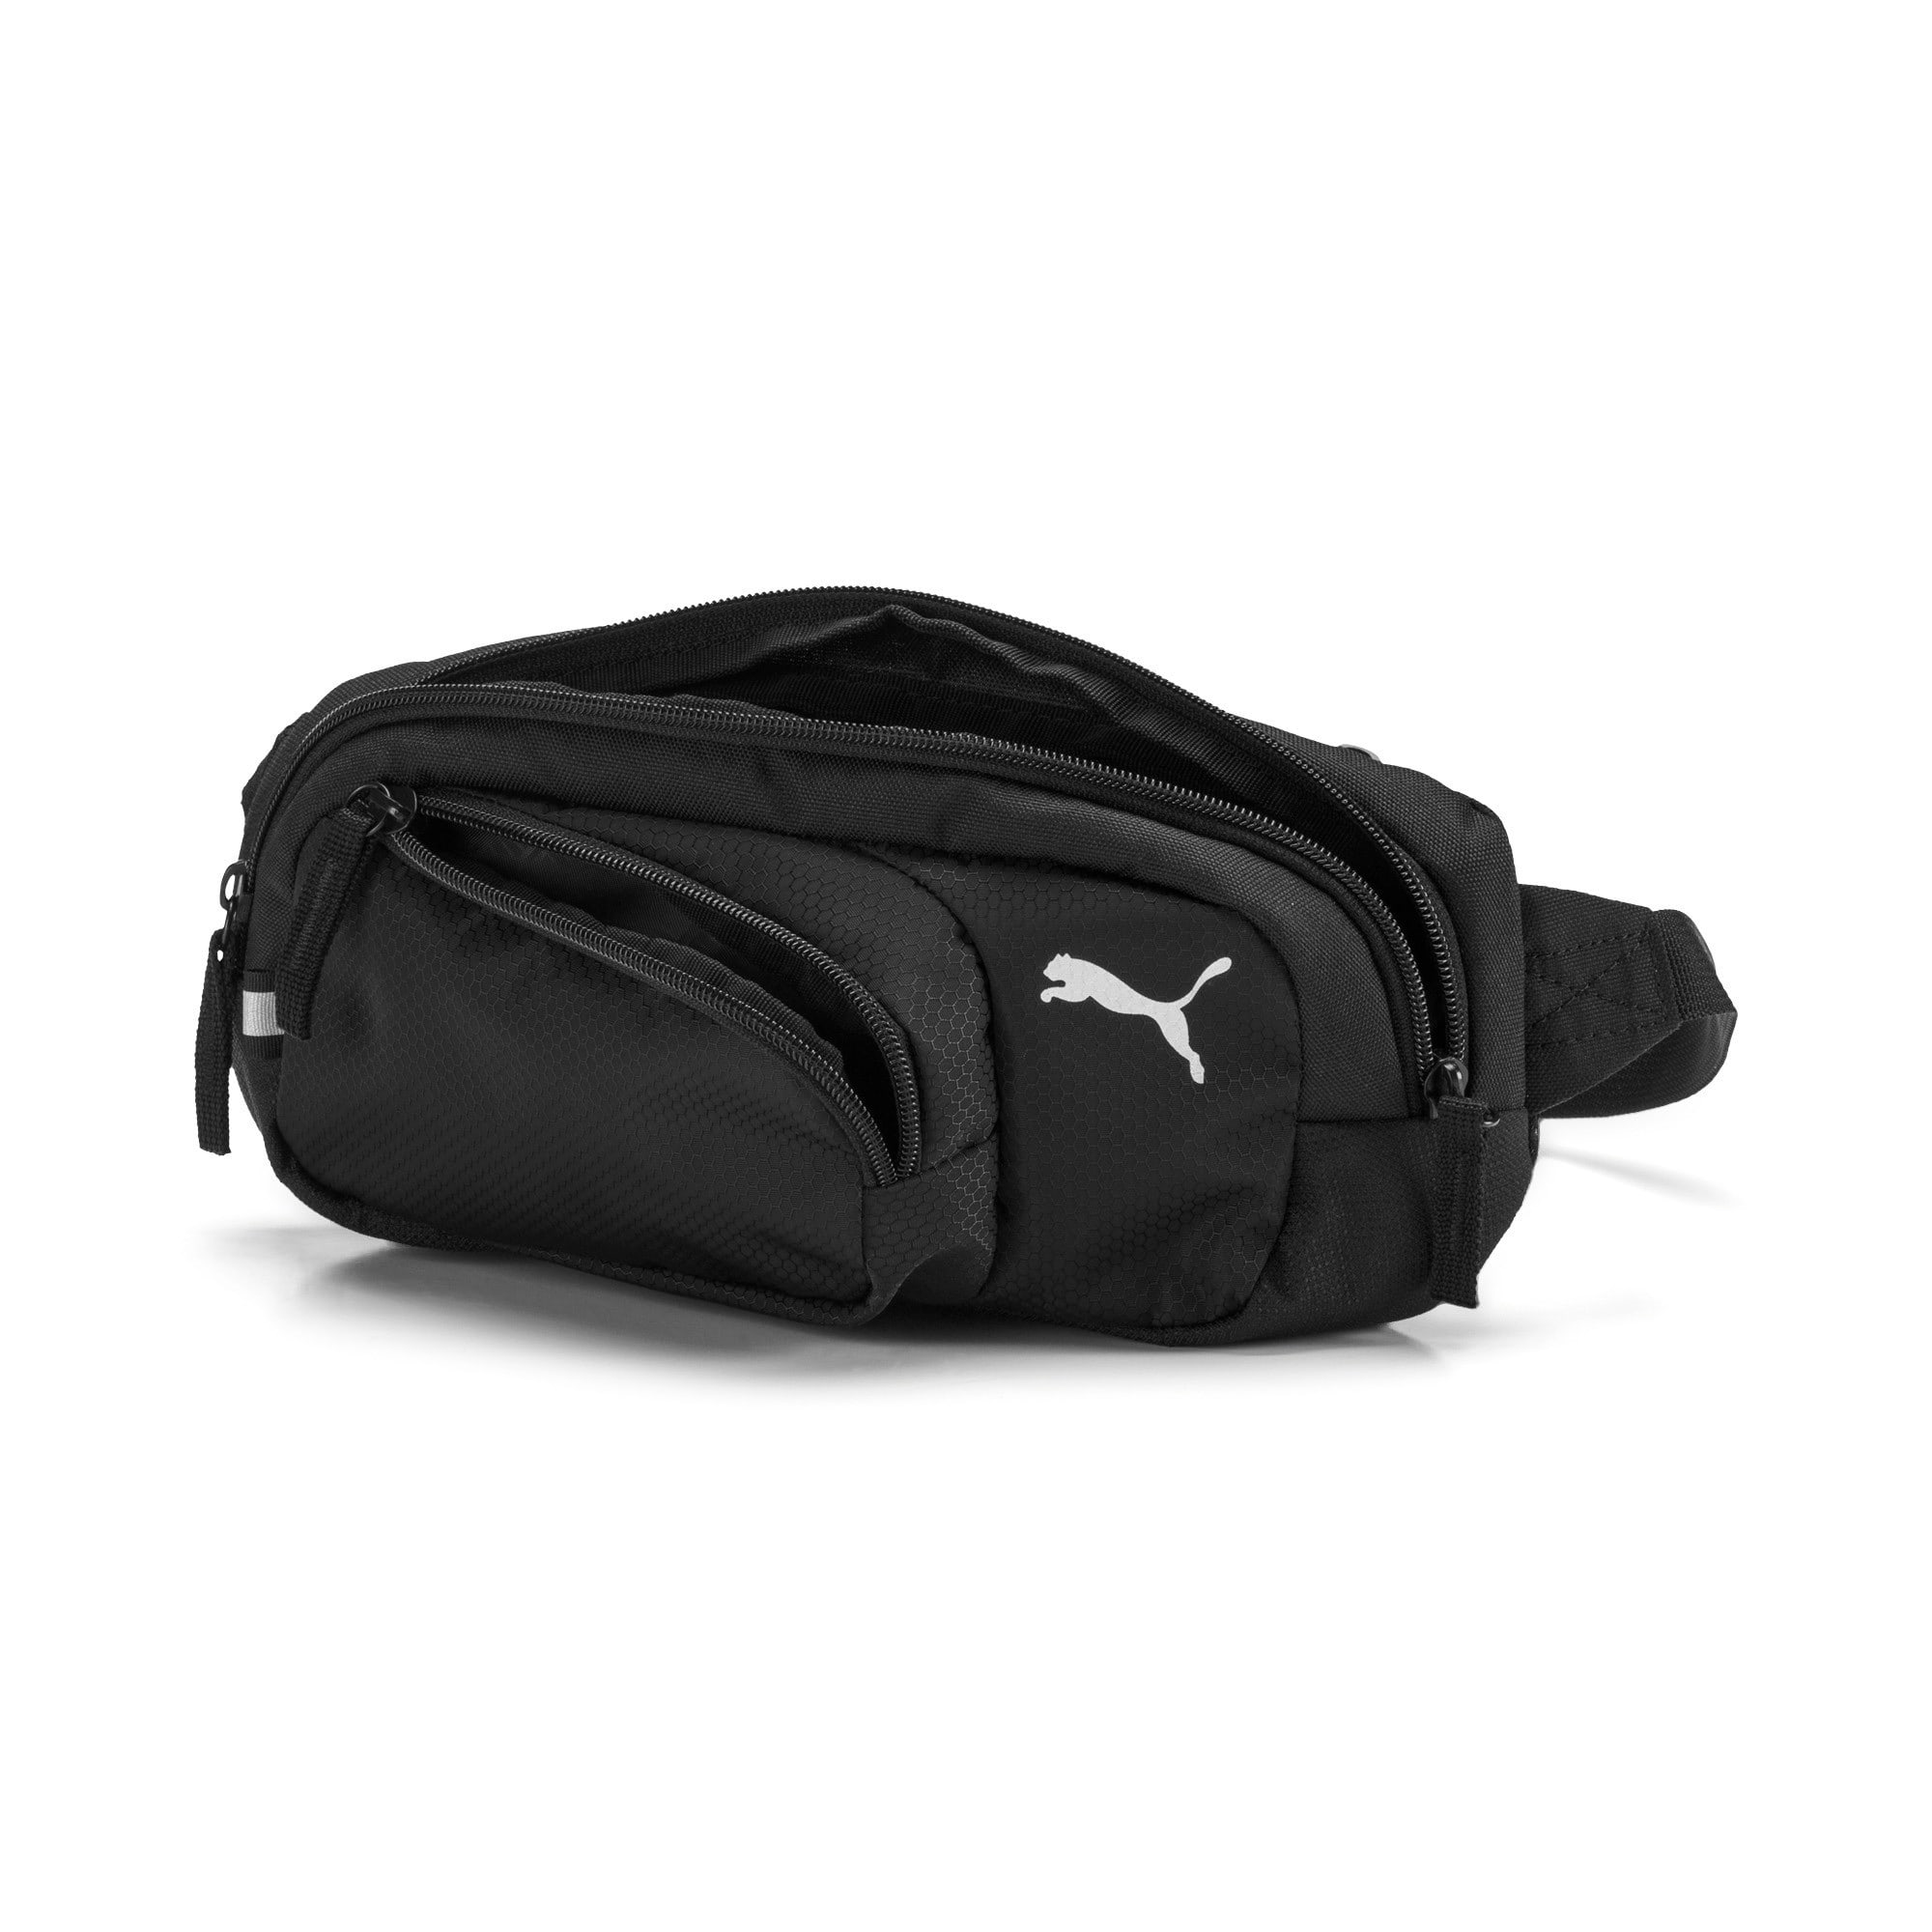 Thumbnail 4 of PUMA X Multi Waist Bag, Puma Black, medium